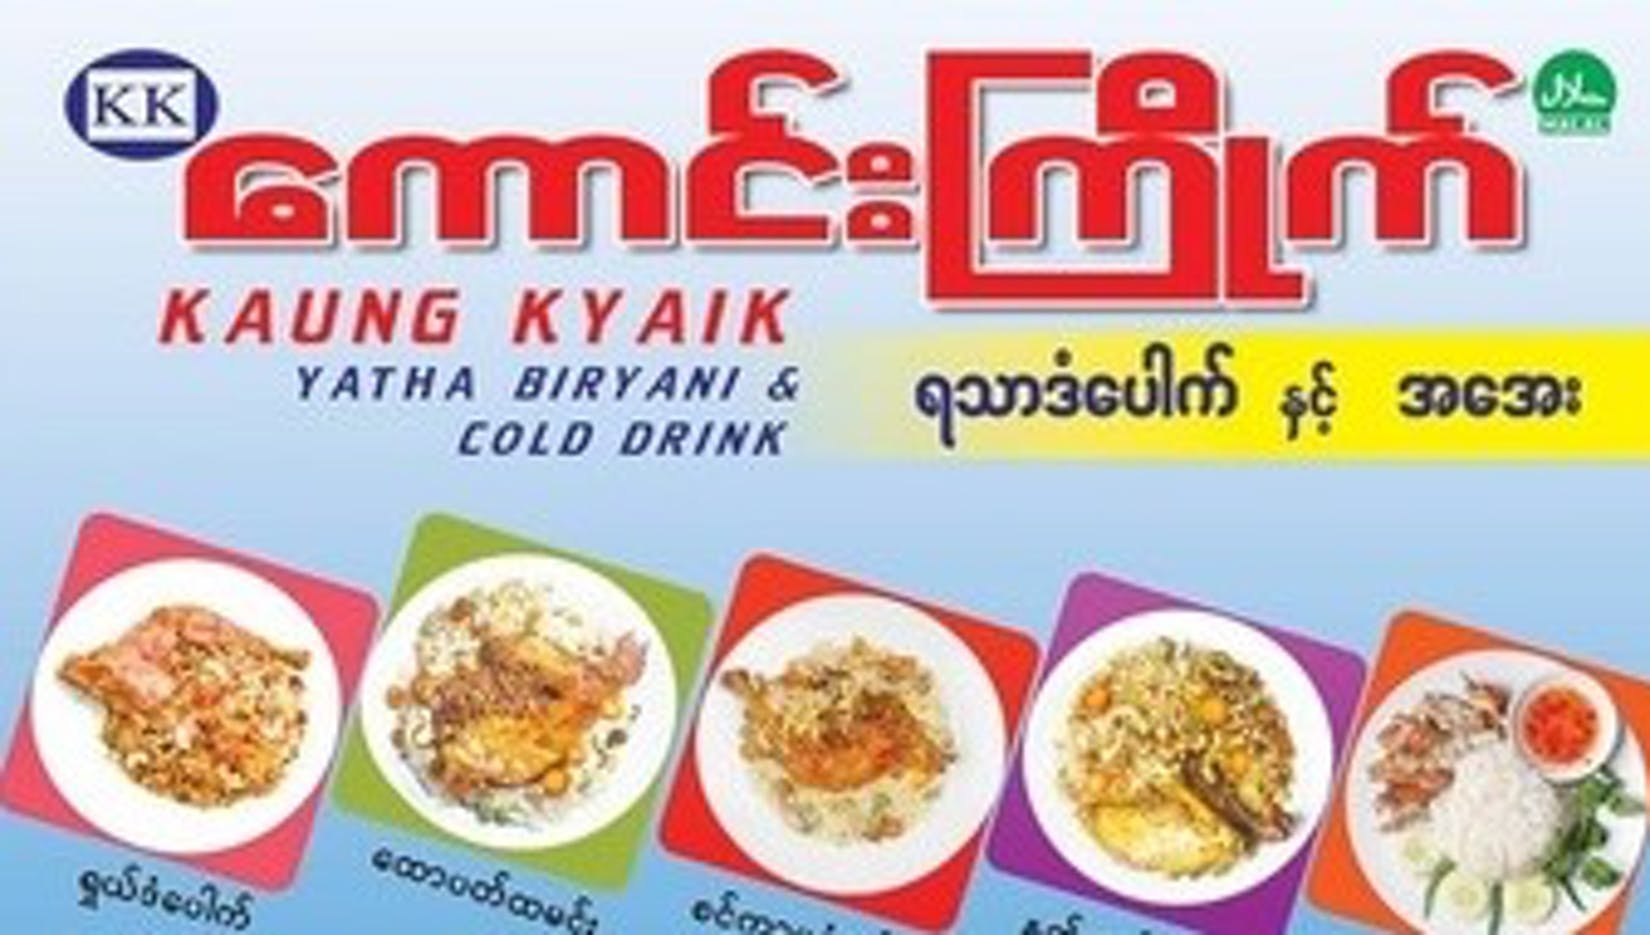 Kaung kyit Briyani | yathar